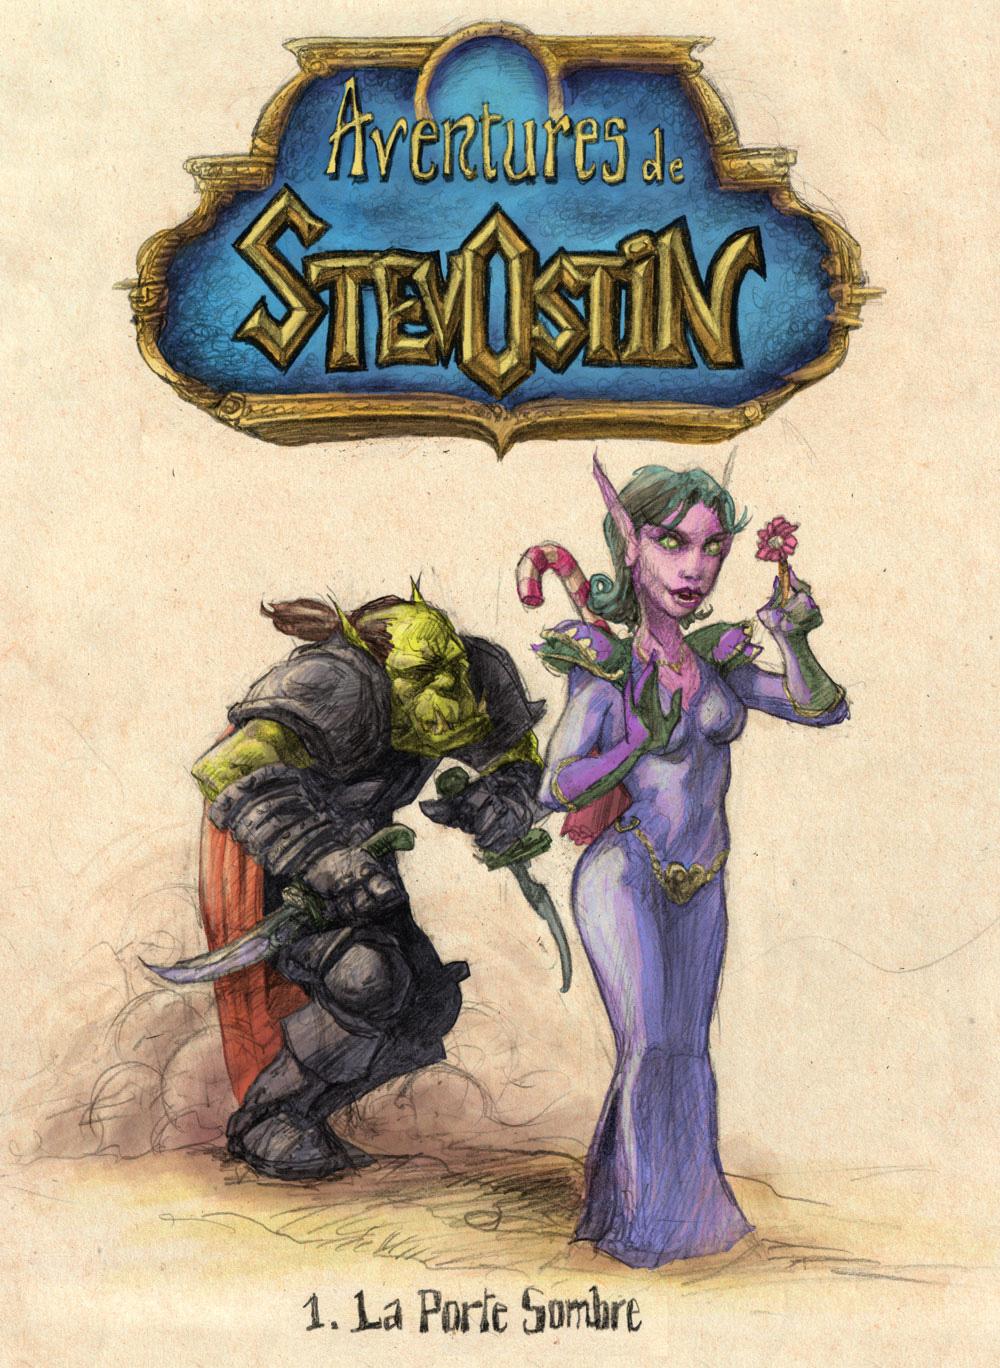 Aventures de Stevostin, tome 1 : La Porte Sombre. Couverture.